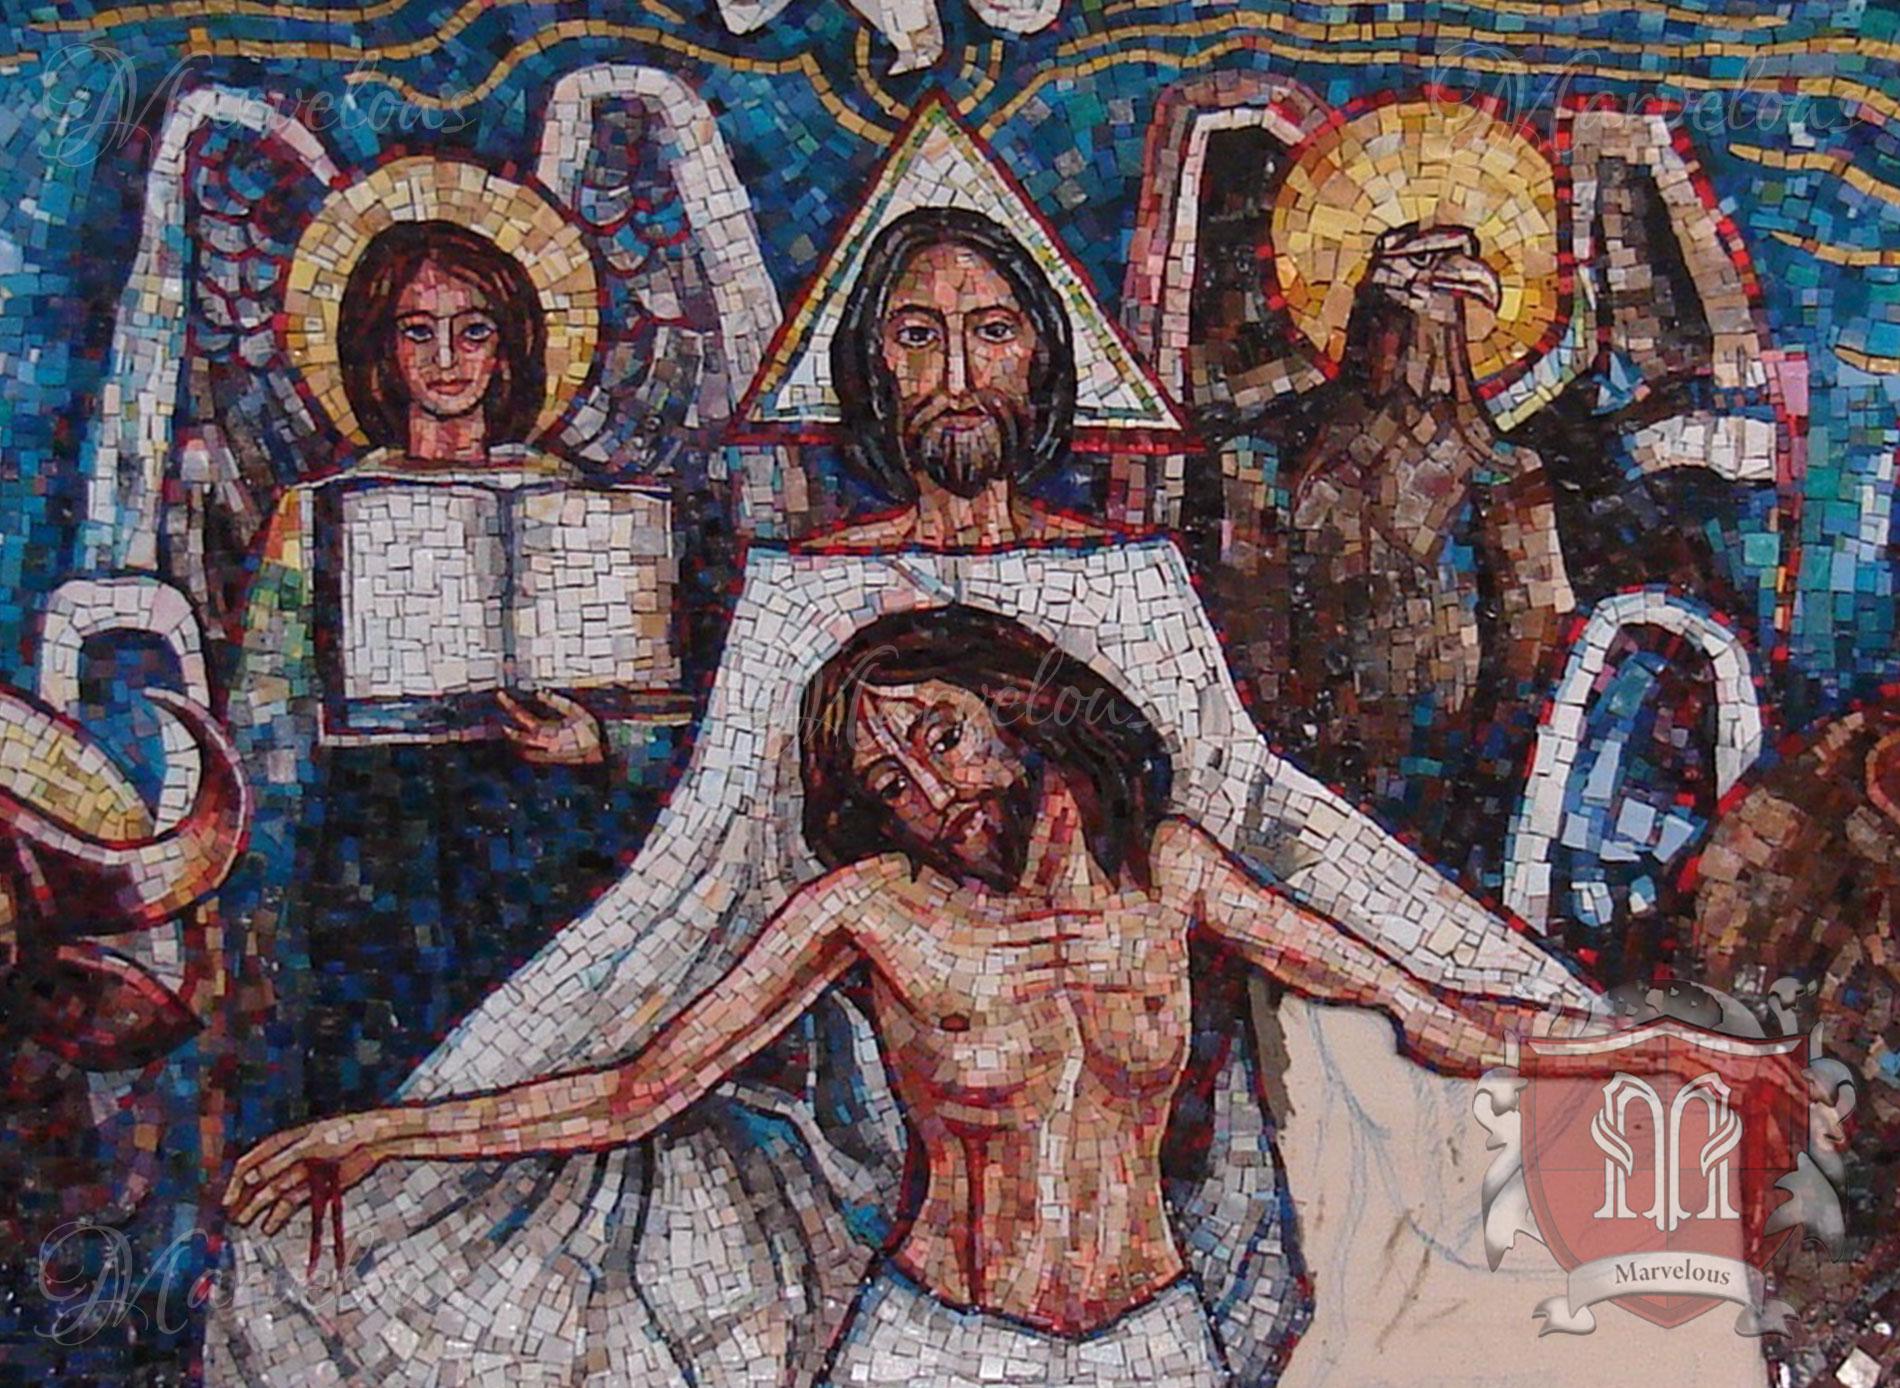 Marble Religious Mosaic: Il Pastore